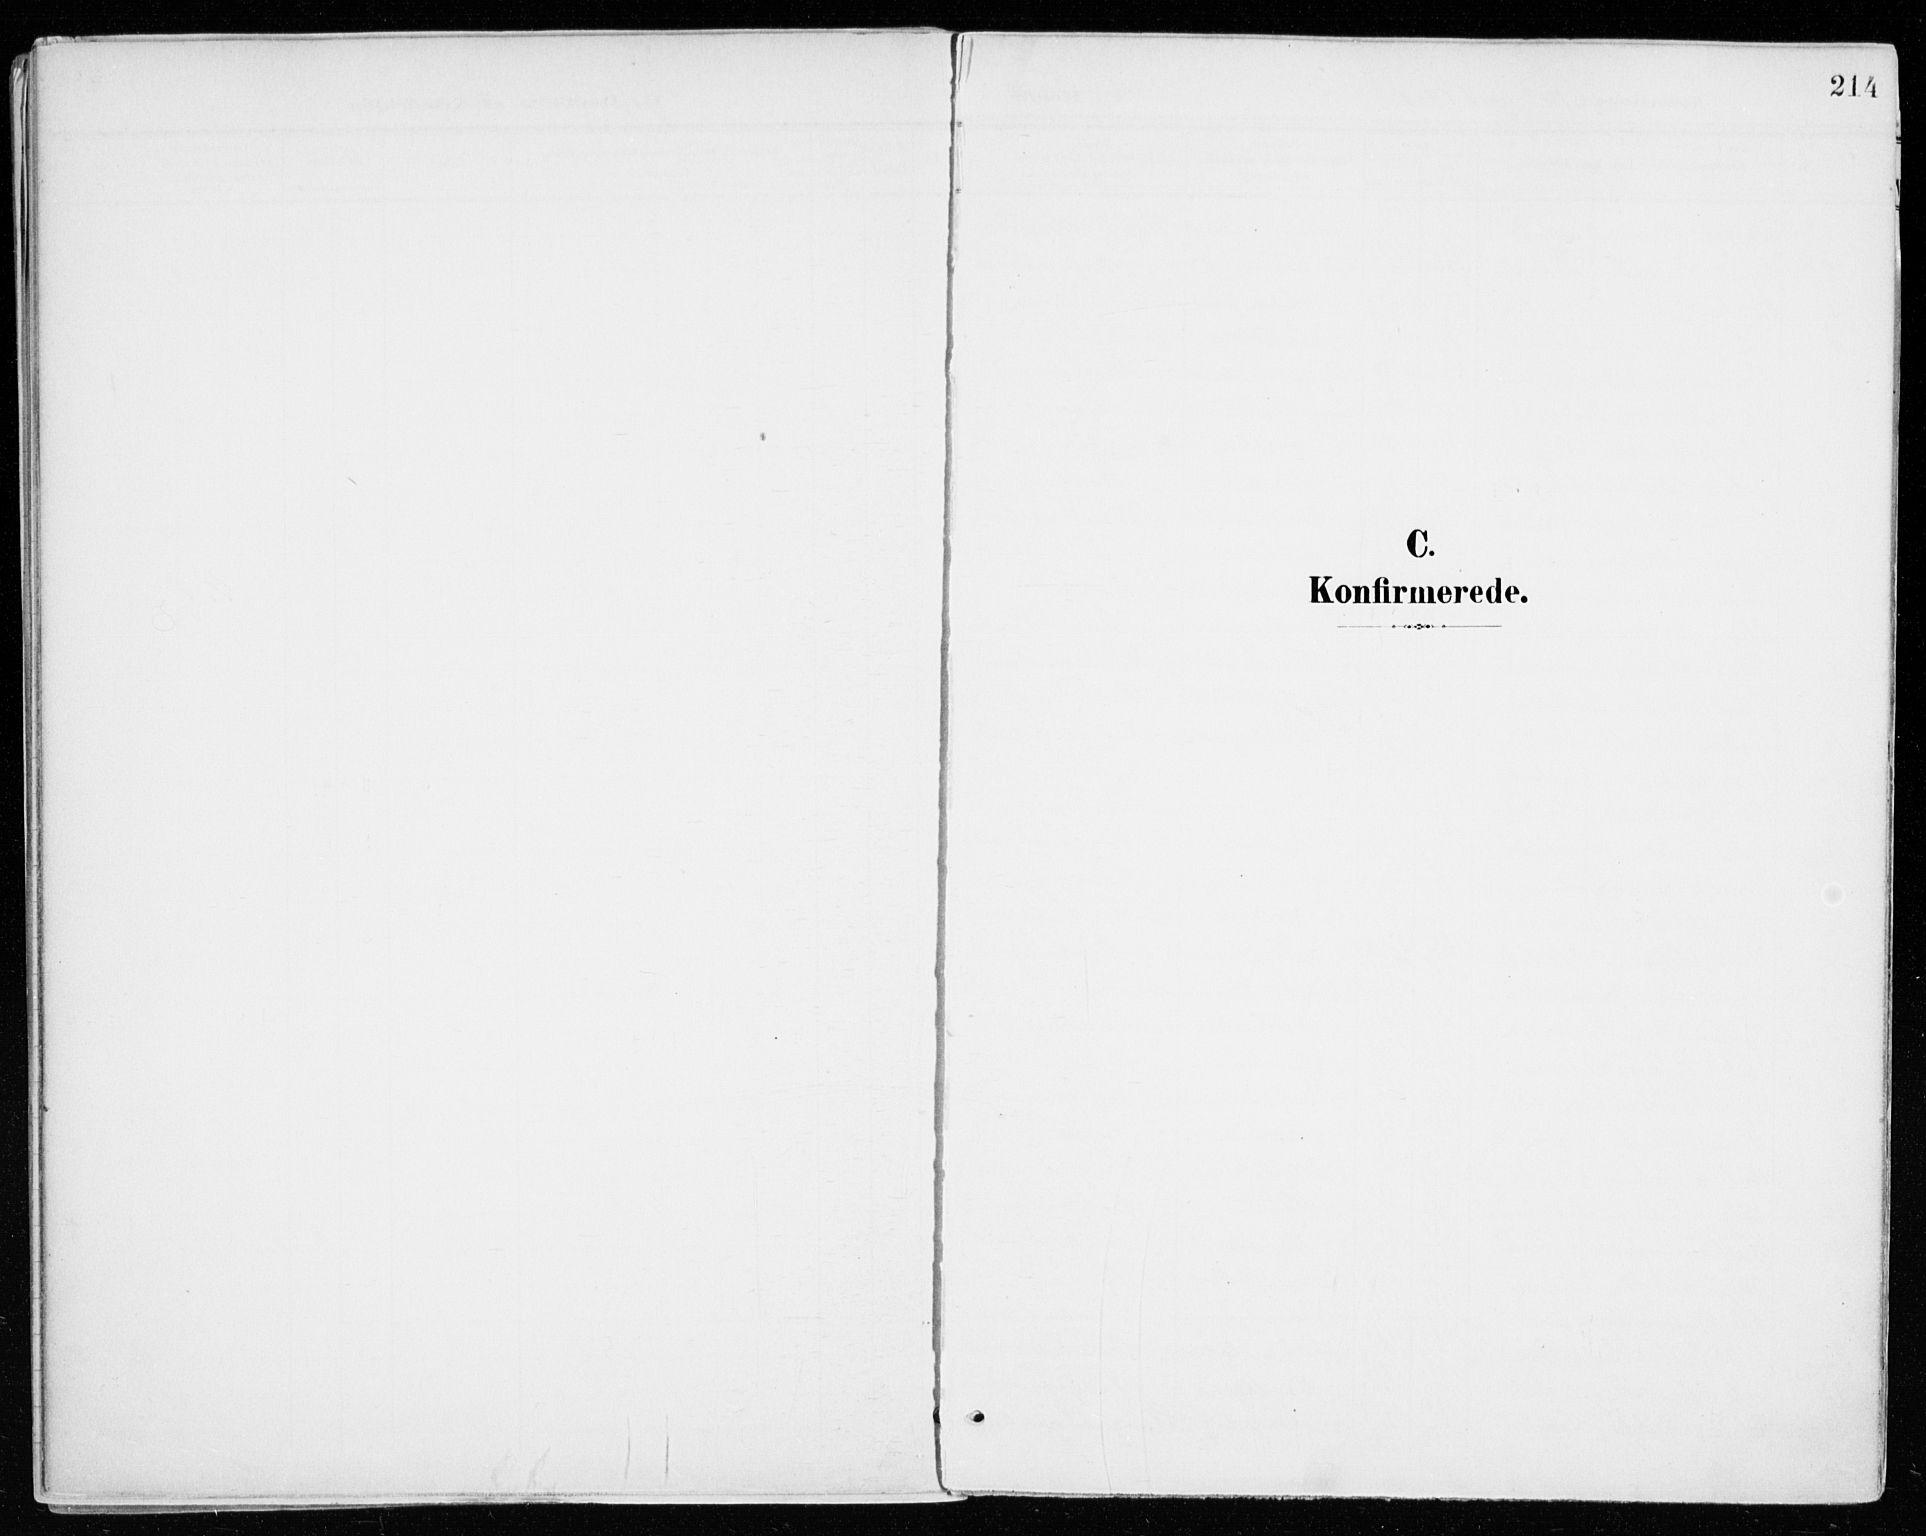 SAH, Vang prestekontor, Hedmark, H/Ha/Haa/L0021: Parish register (official) no. 21, 1902-1917, p. 214